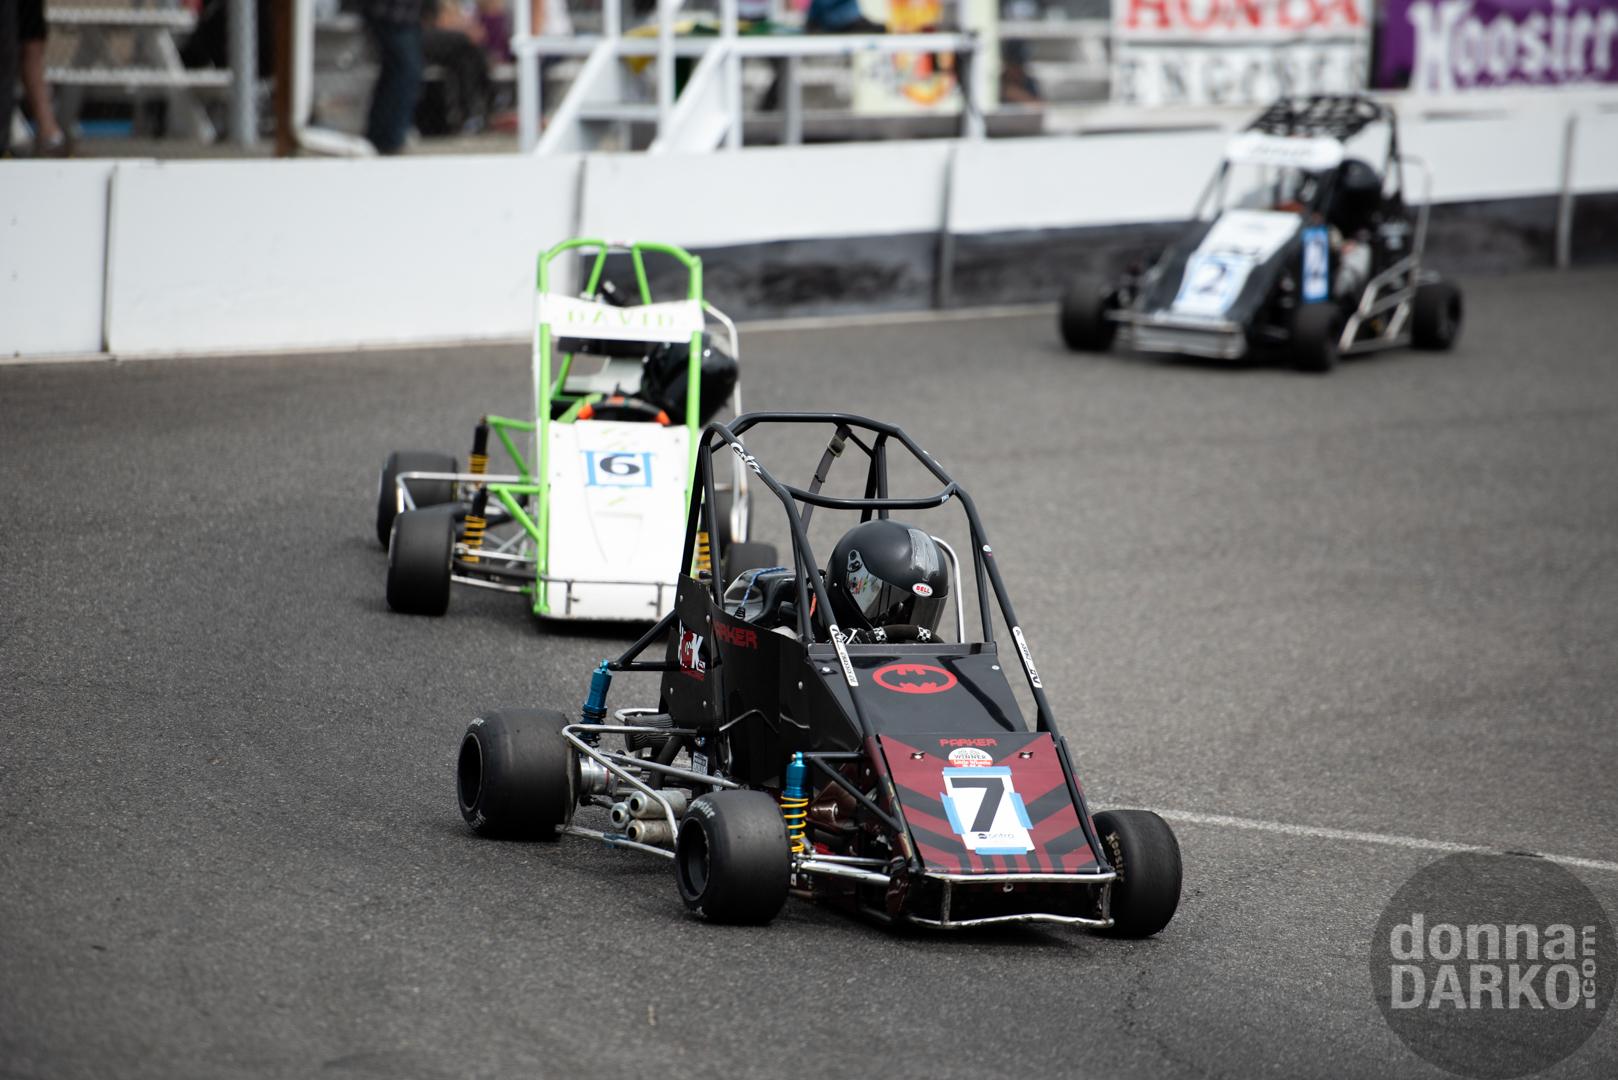 QWMA (Racing) 8-11-2019 DSC_7091.jpg